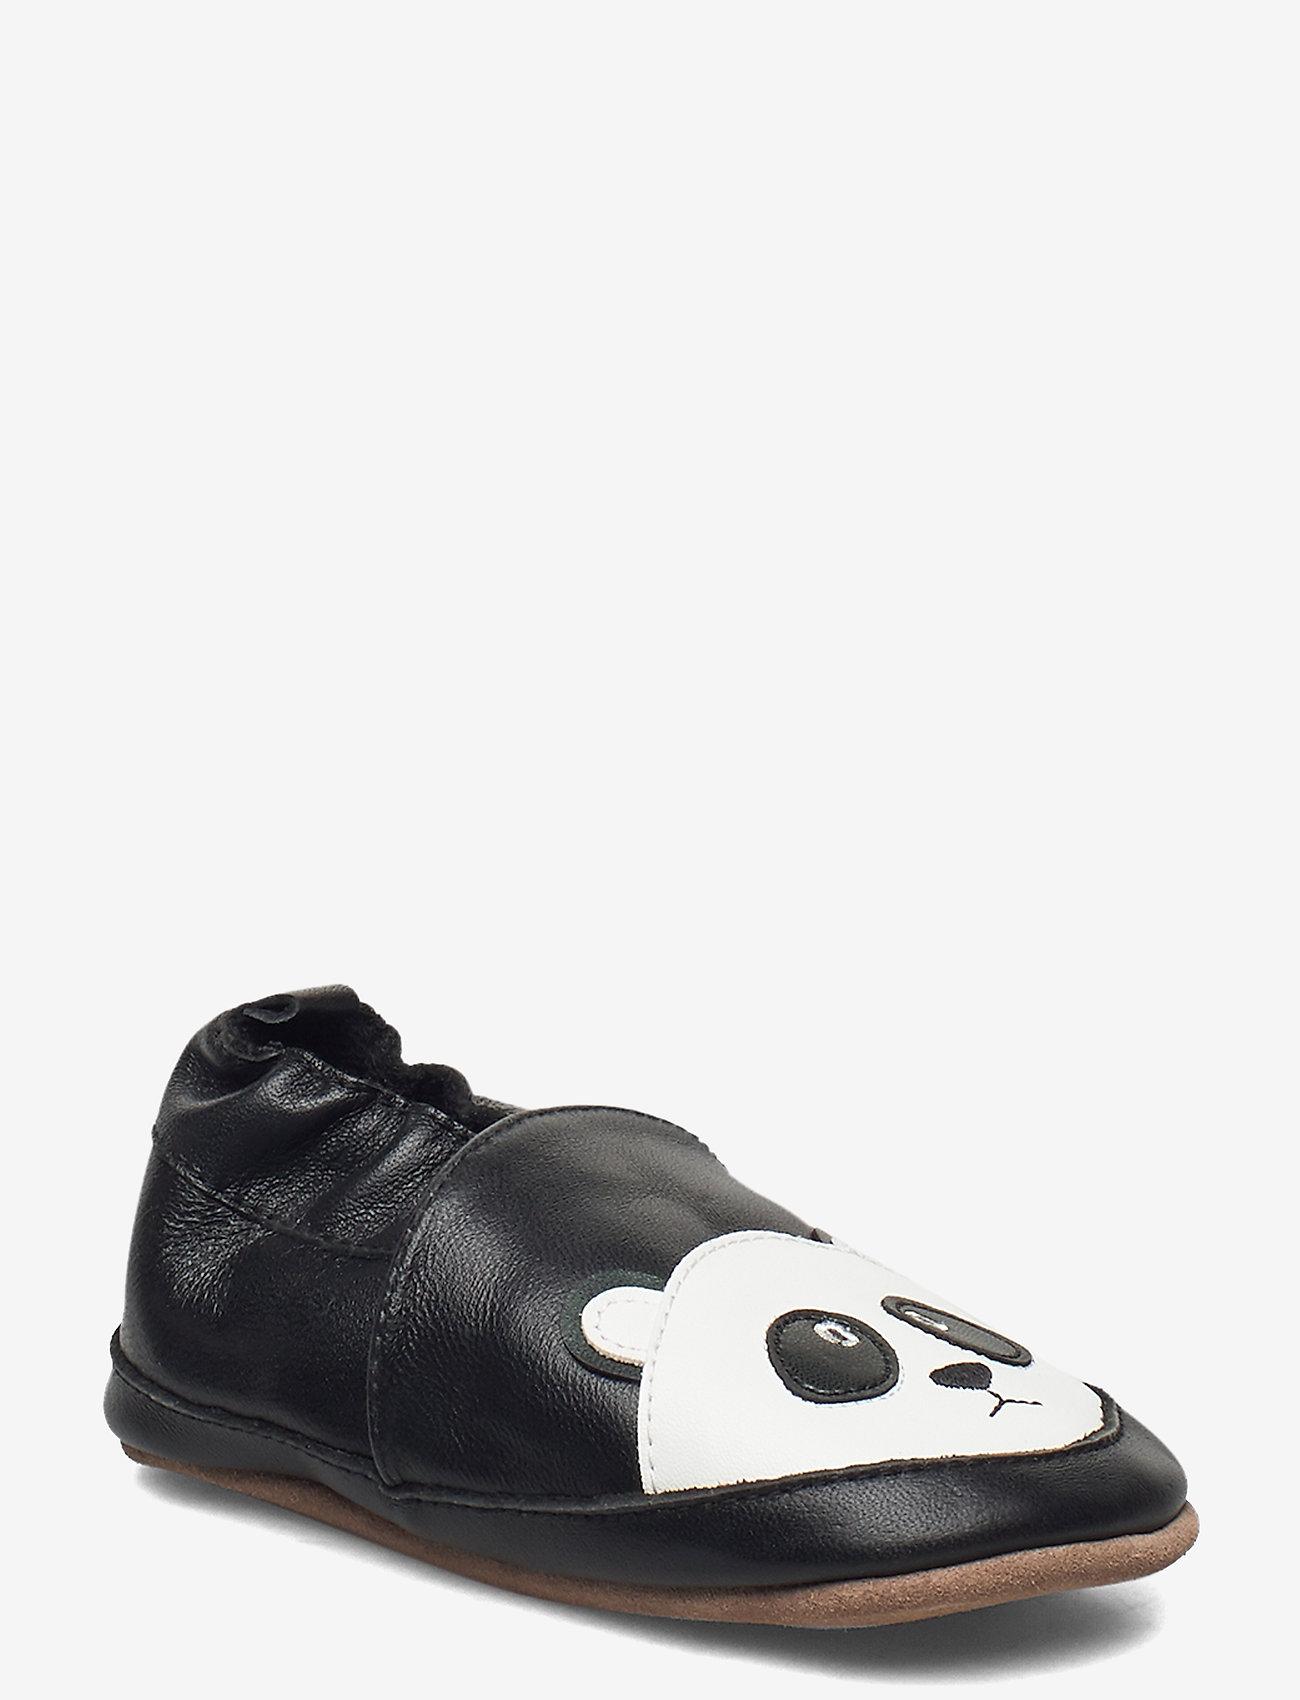 Melton - Leather Shoe - Panda - schuhe - black - 0